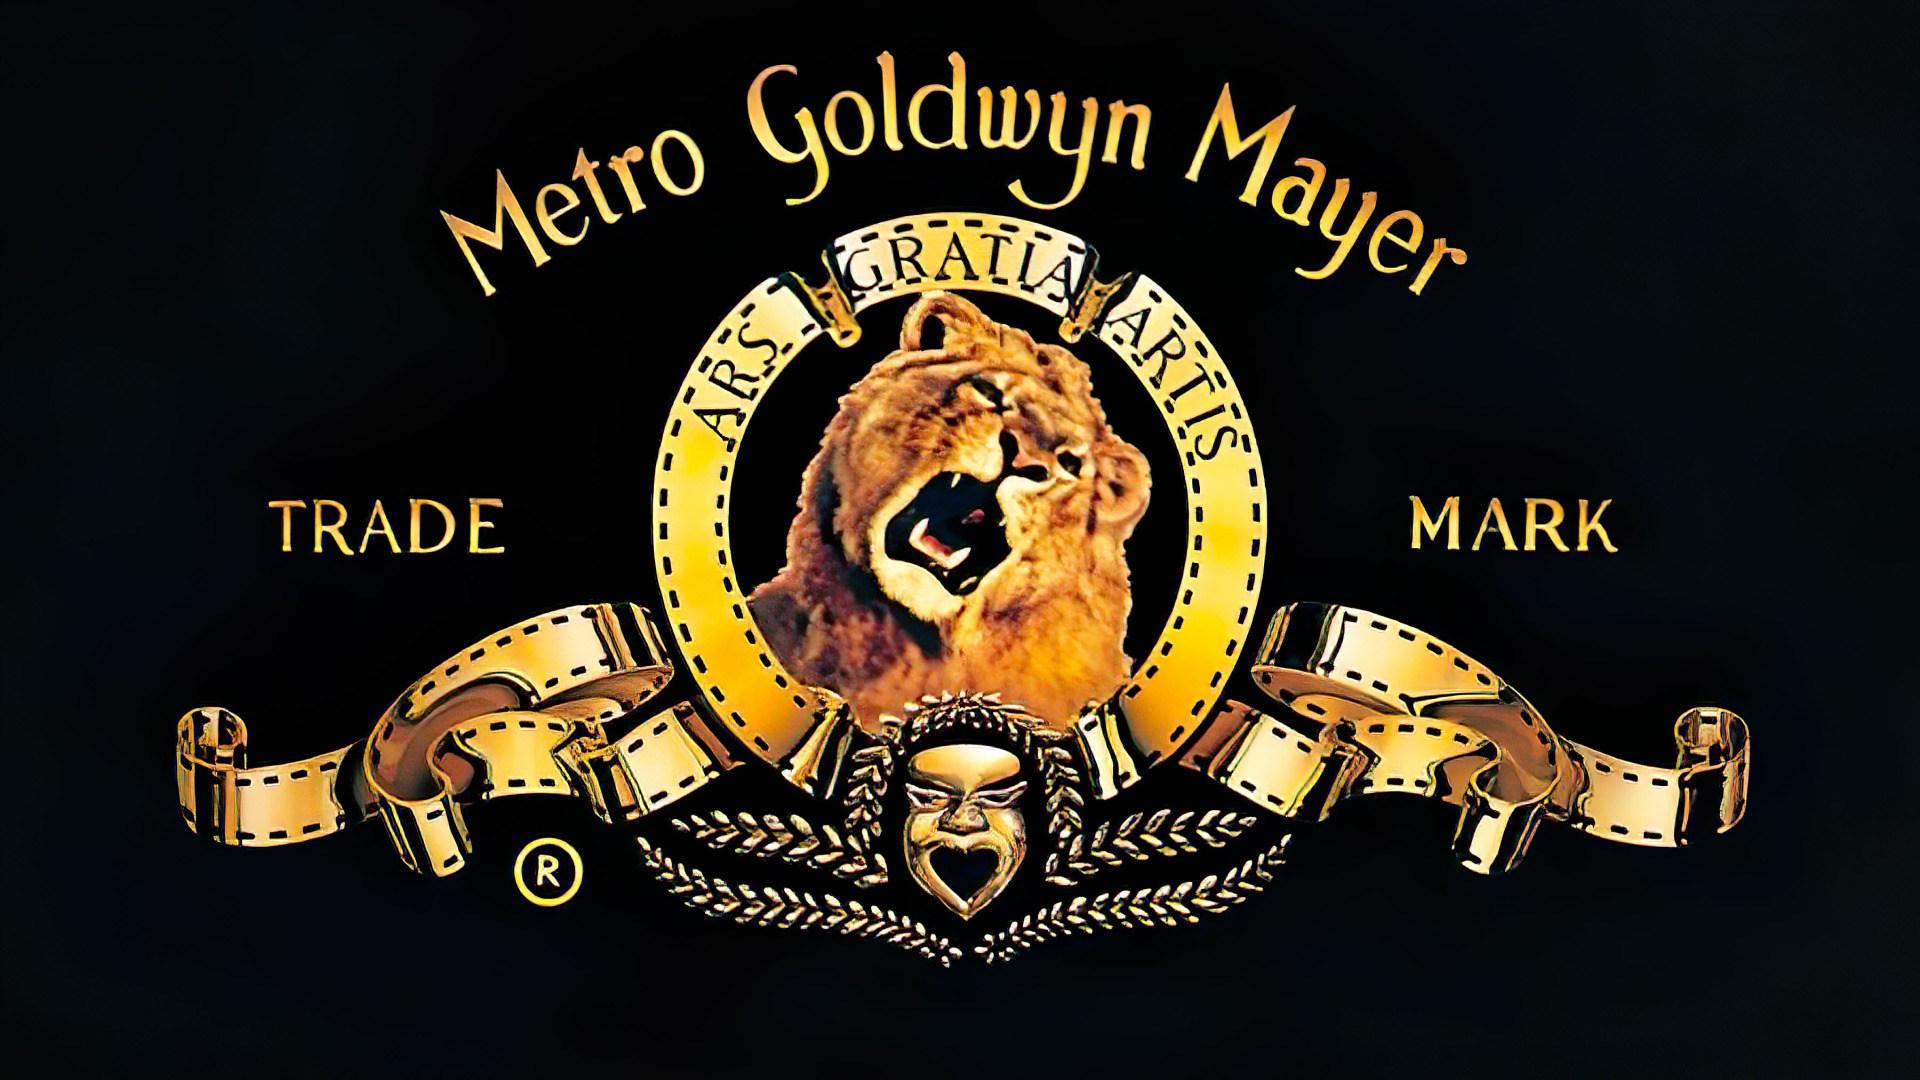 Filmstudio, MGM, filmverleih, Löwe, Metro Goldwyn Mayer, Filmproduktion